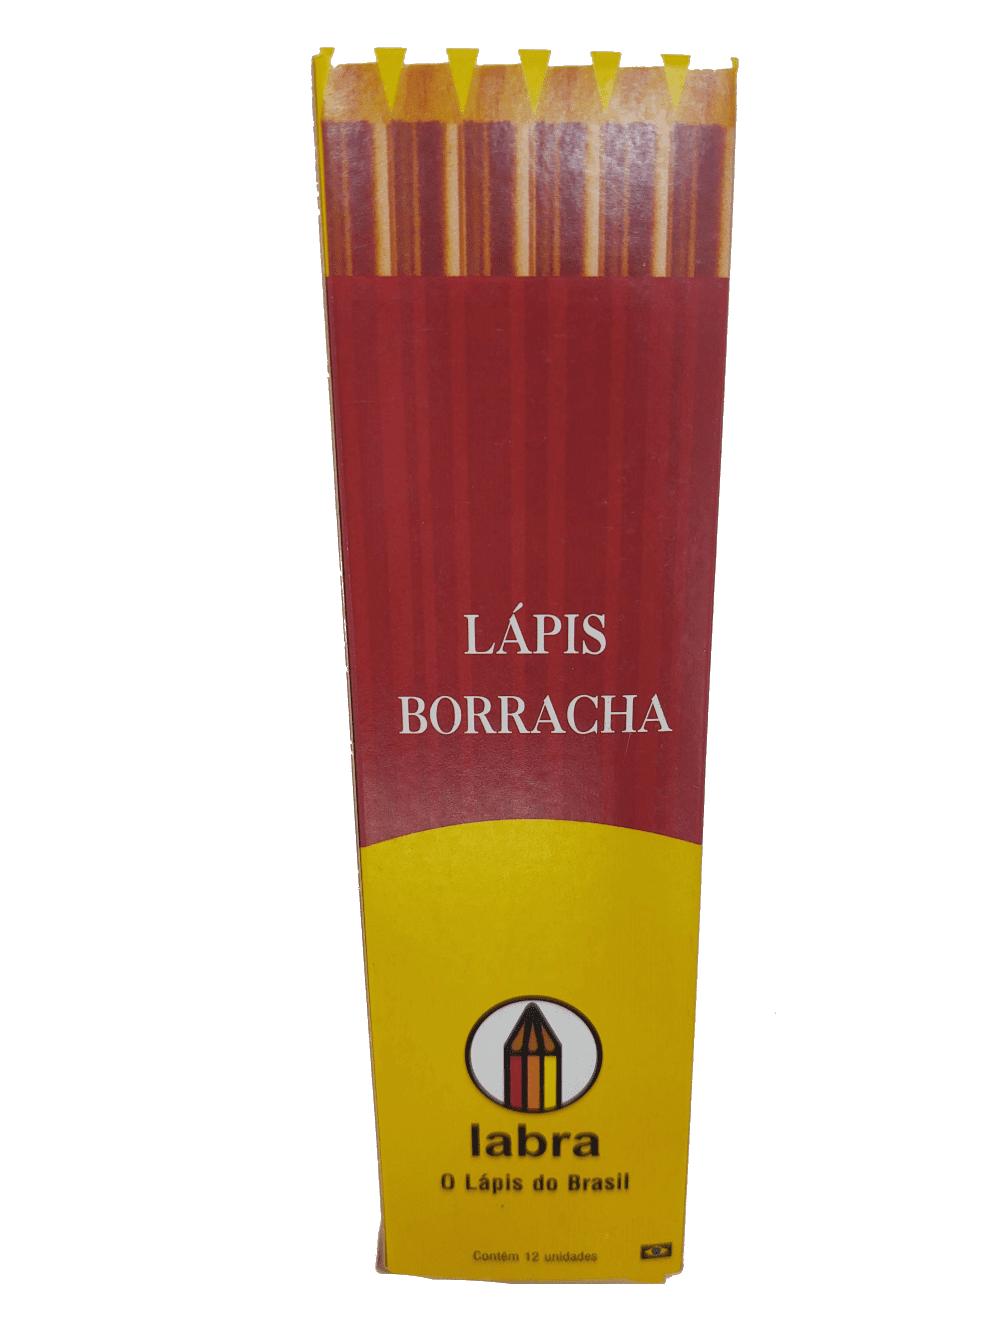 Lápis Borracha 12 Unidades Labra